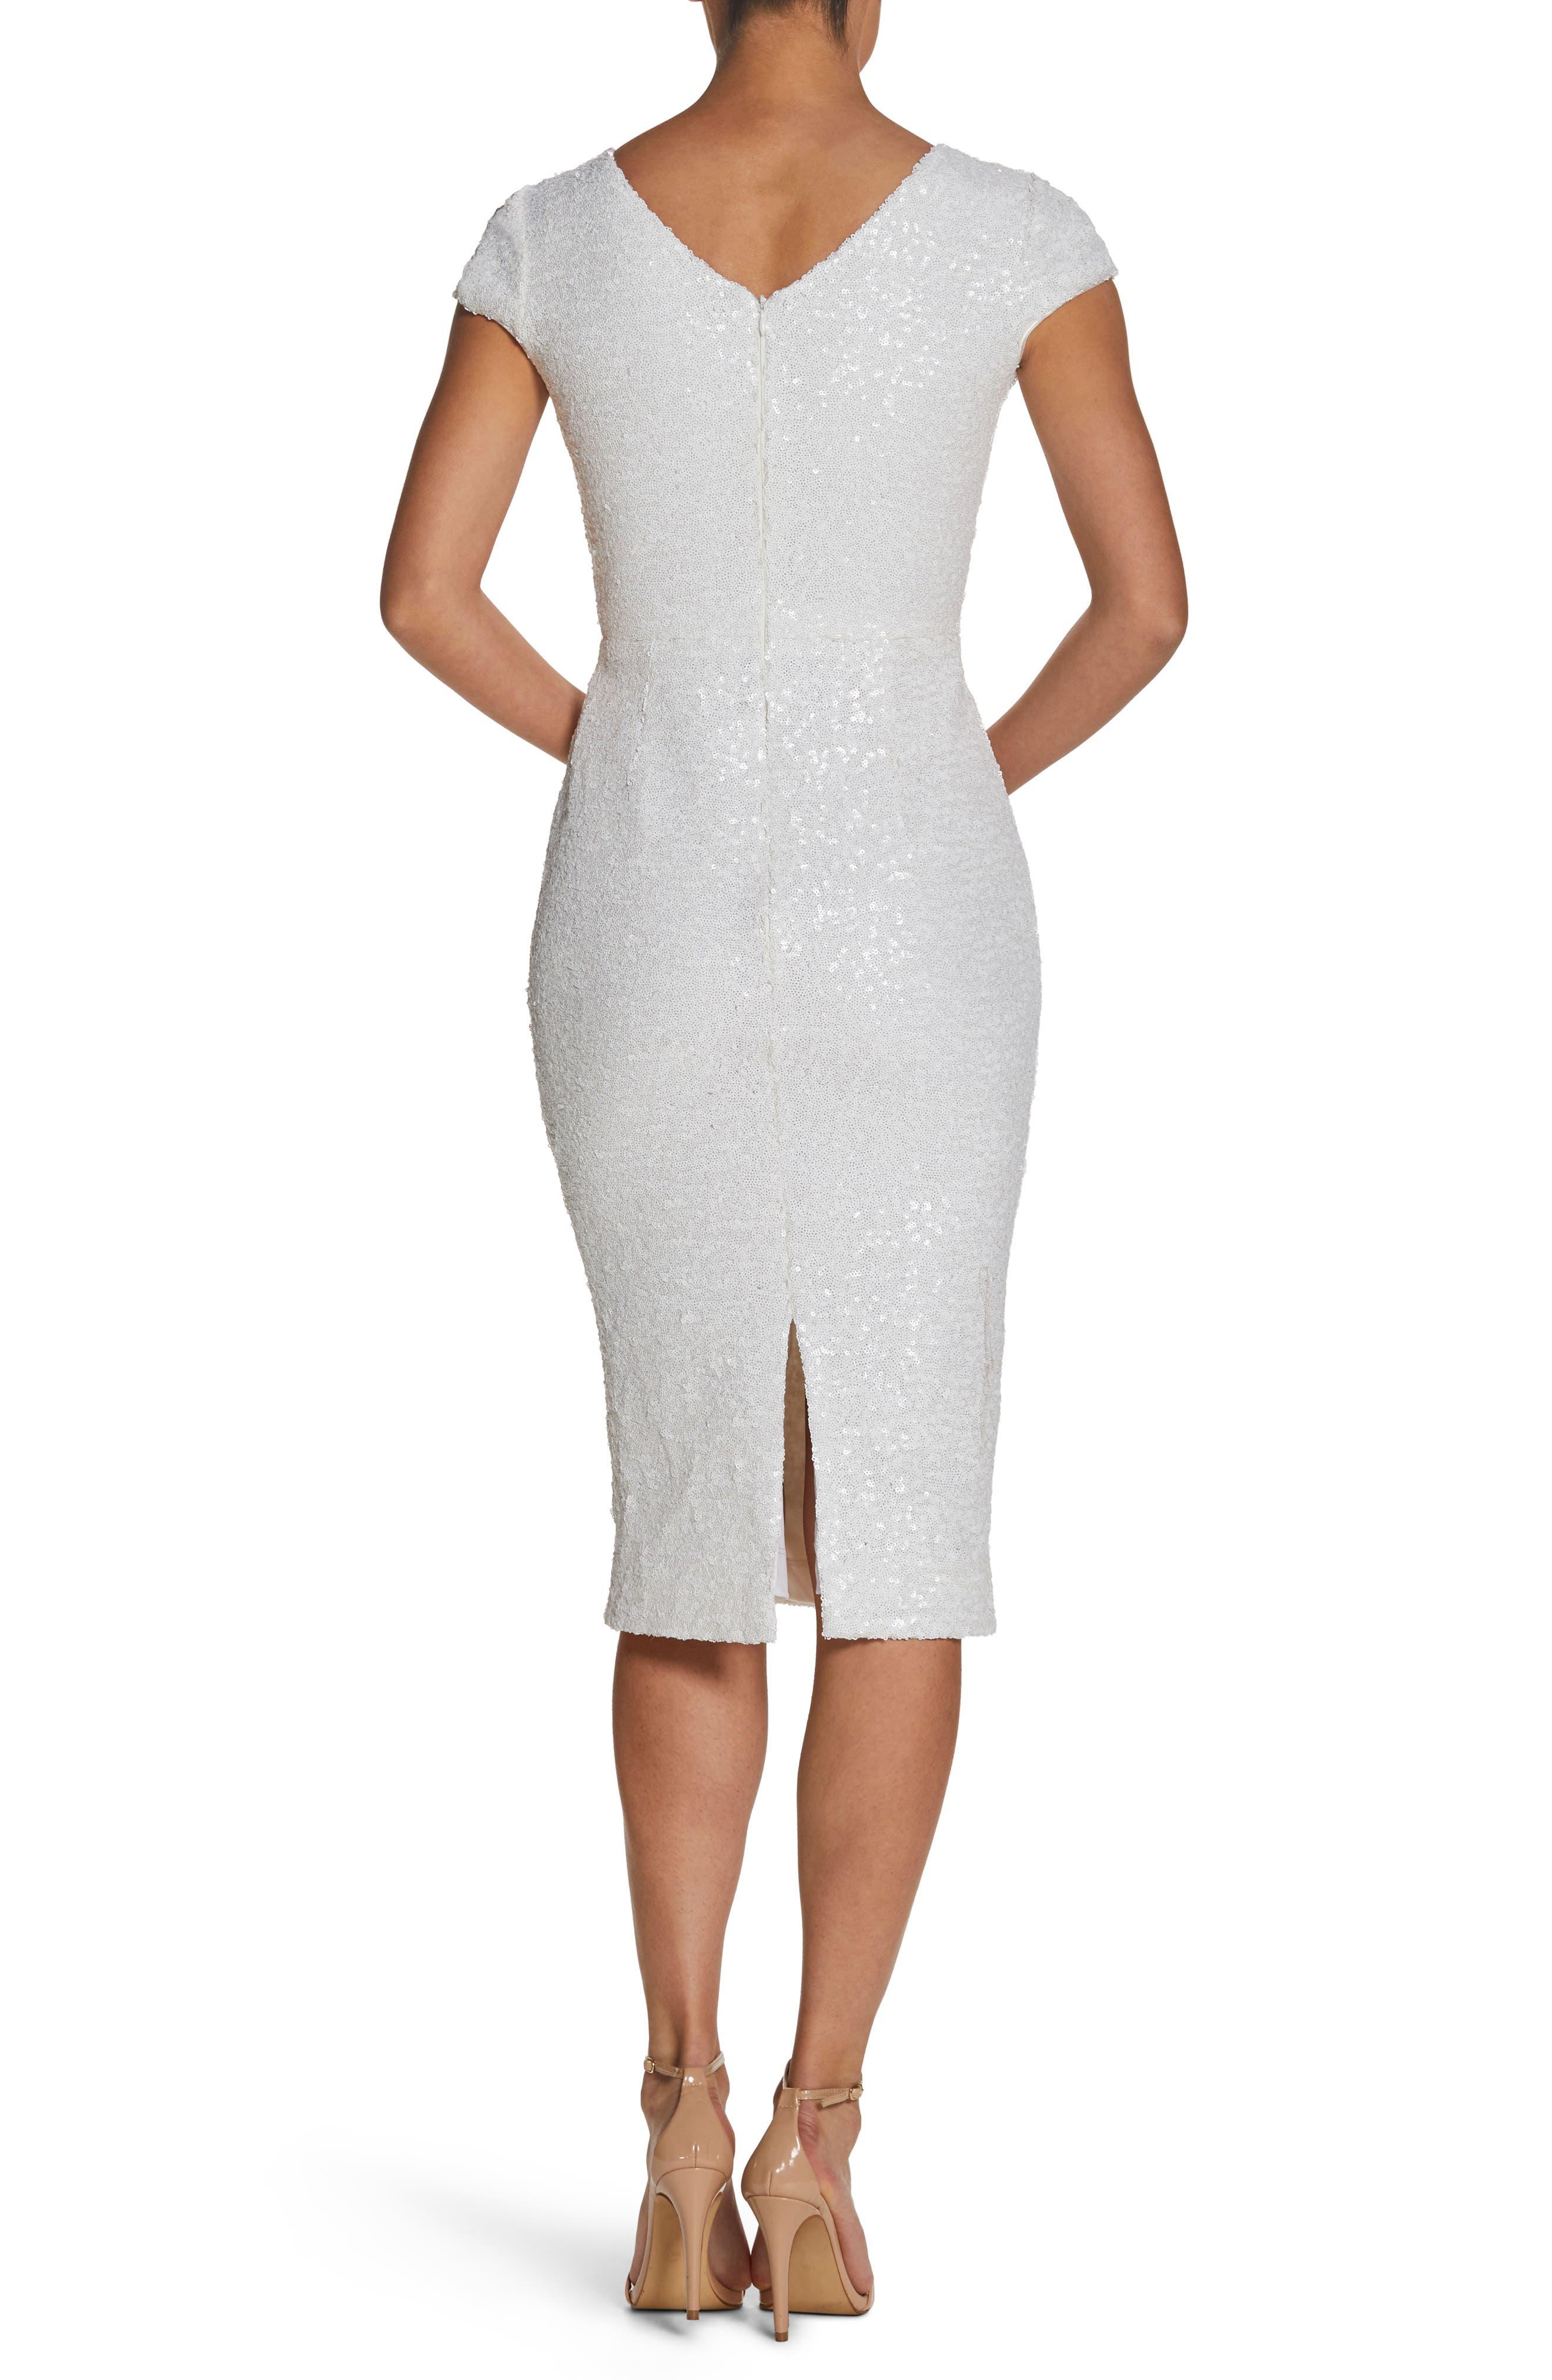 Allison Sequin Sheath Dress,                             Alternate thumbnail 2, color,                             White